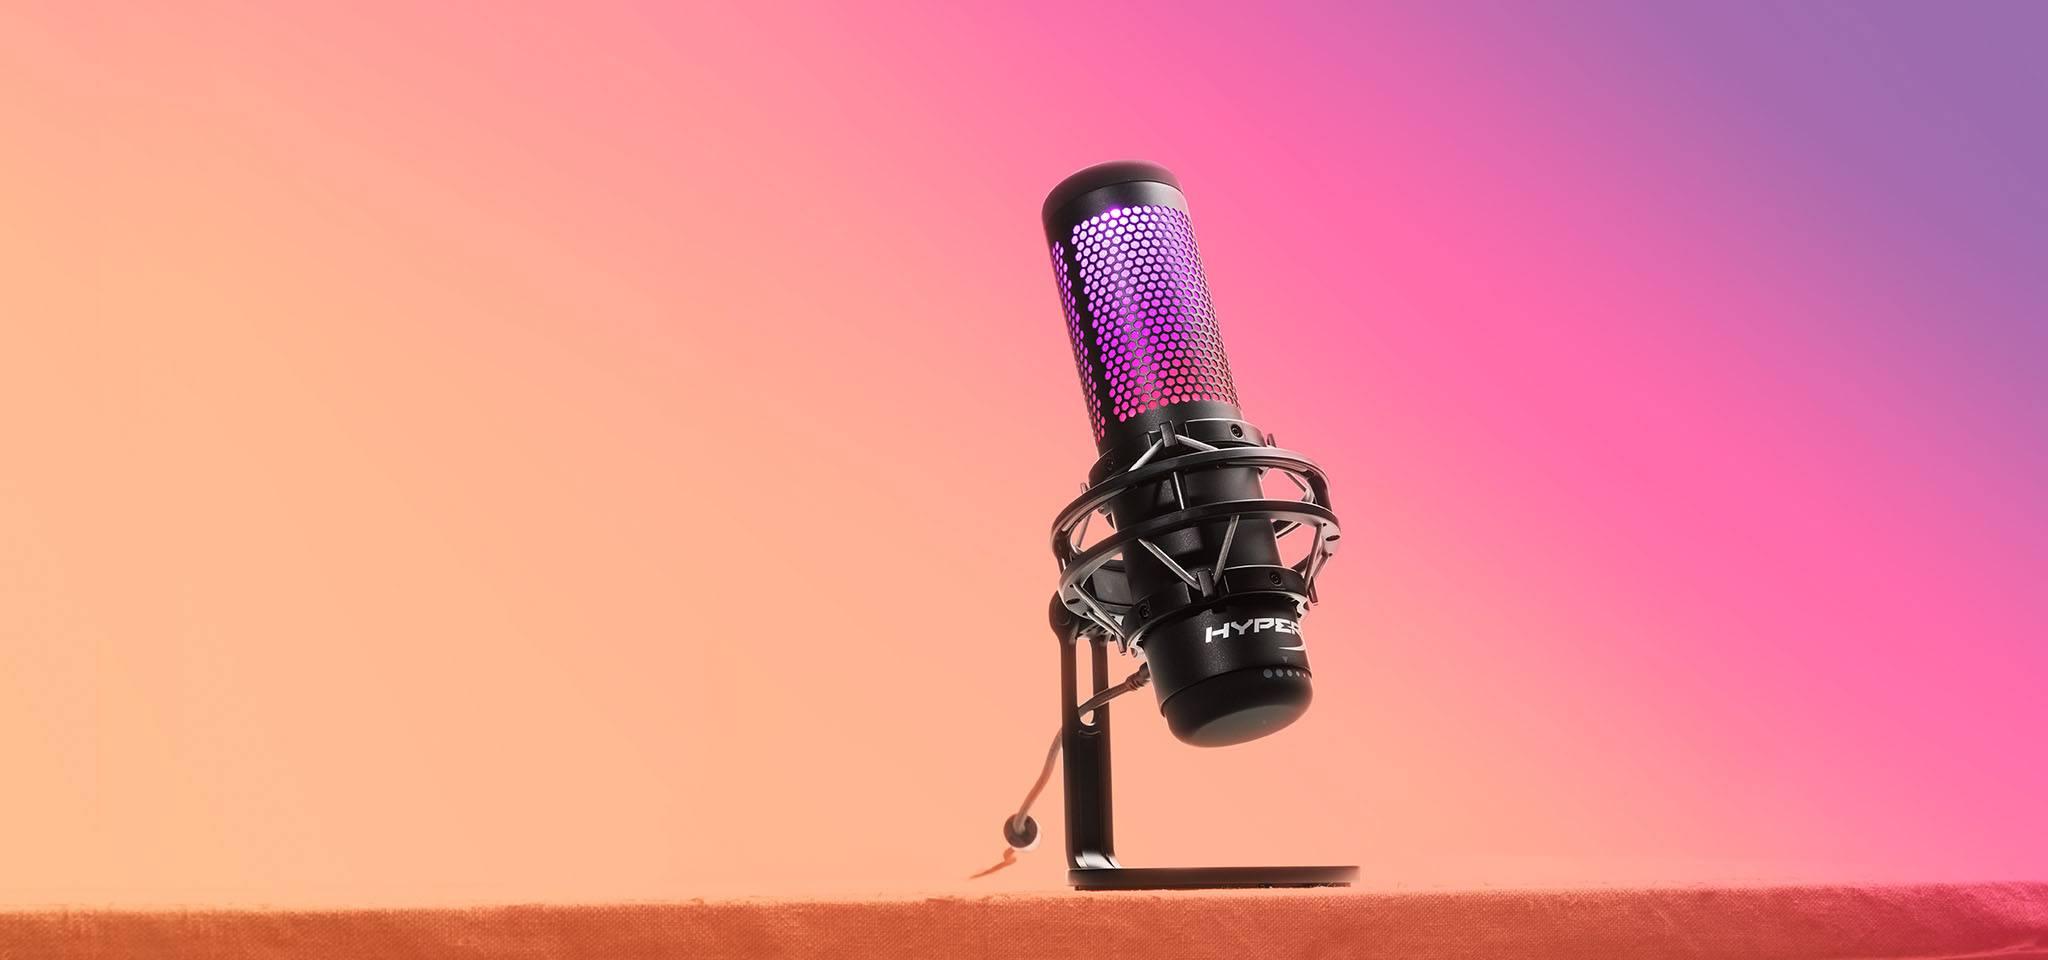 Giới thiệu Microphone Kingston HyperX QuadCast S RGB - HMIQ1S-XX-RG/G